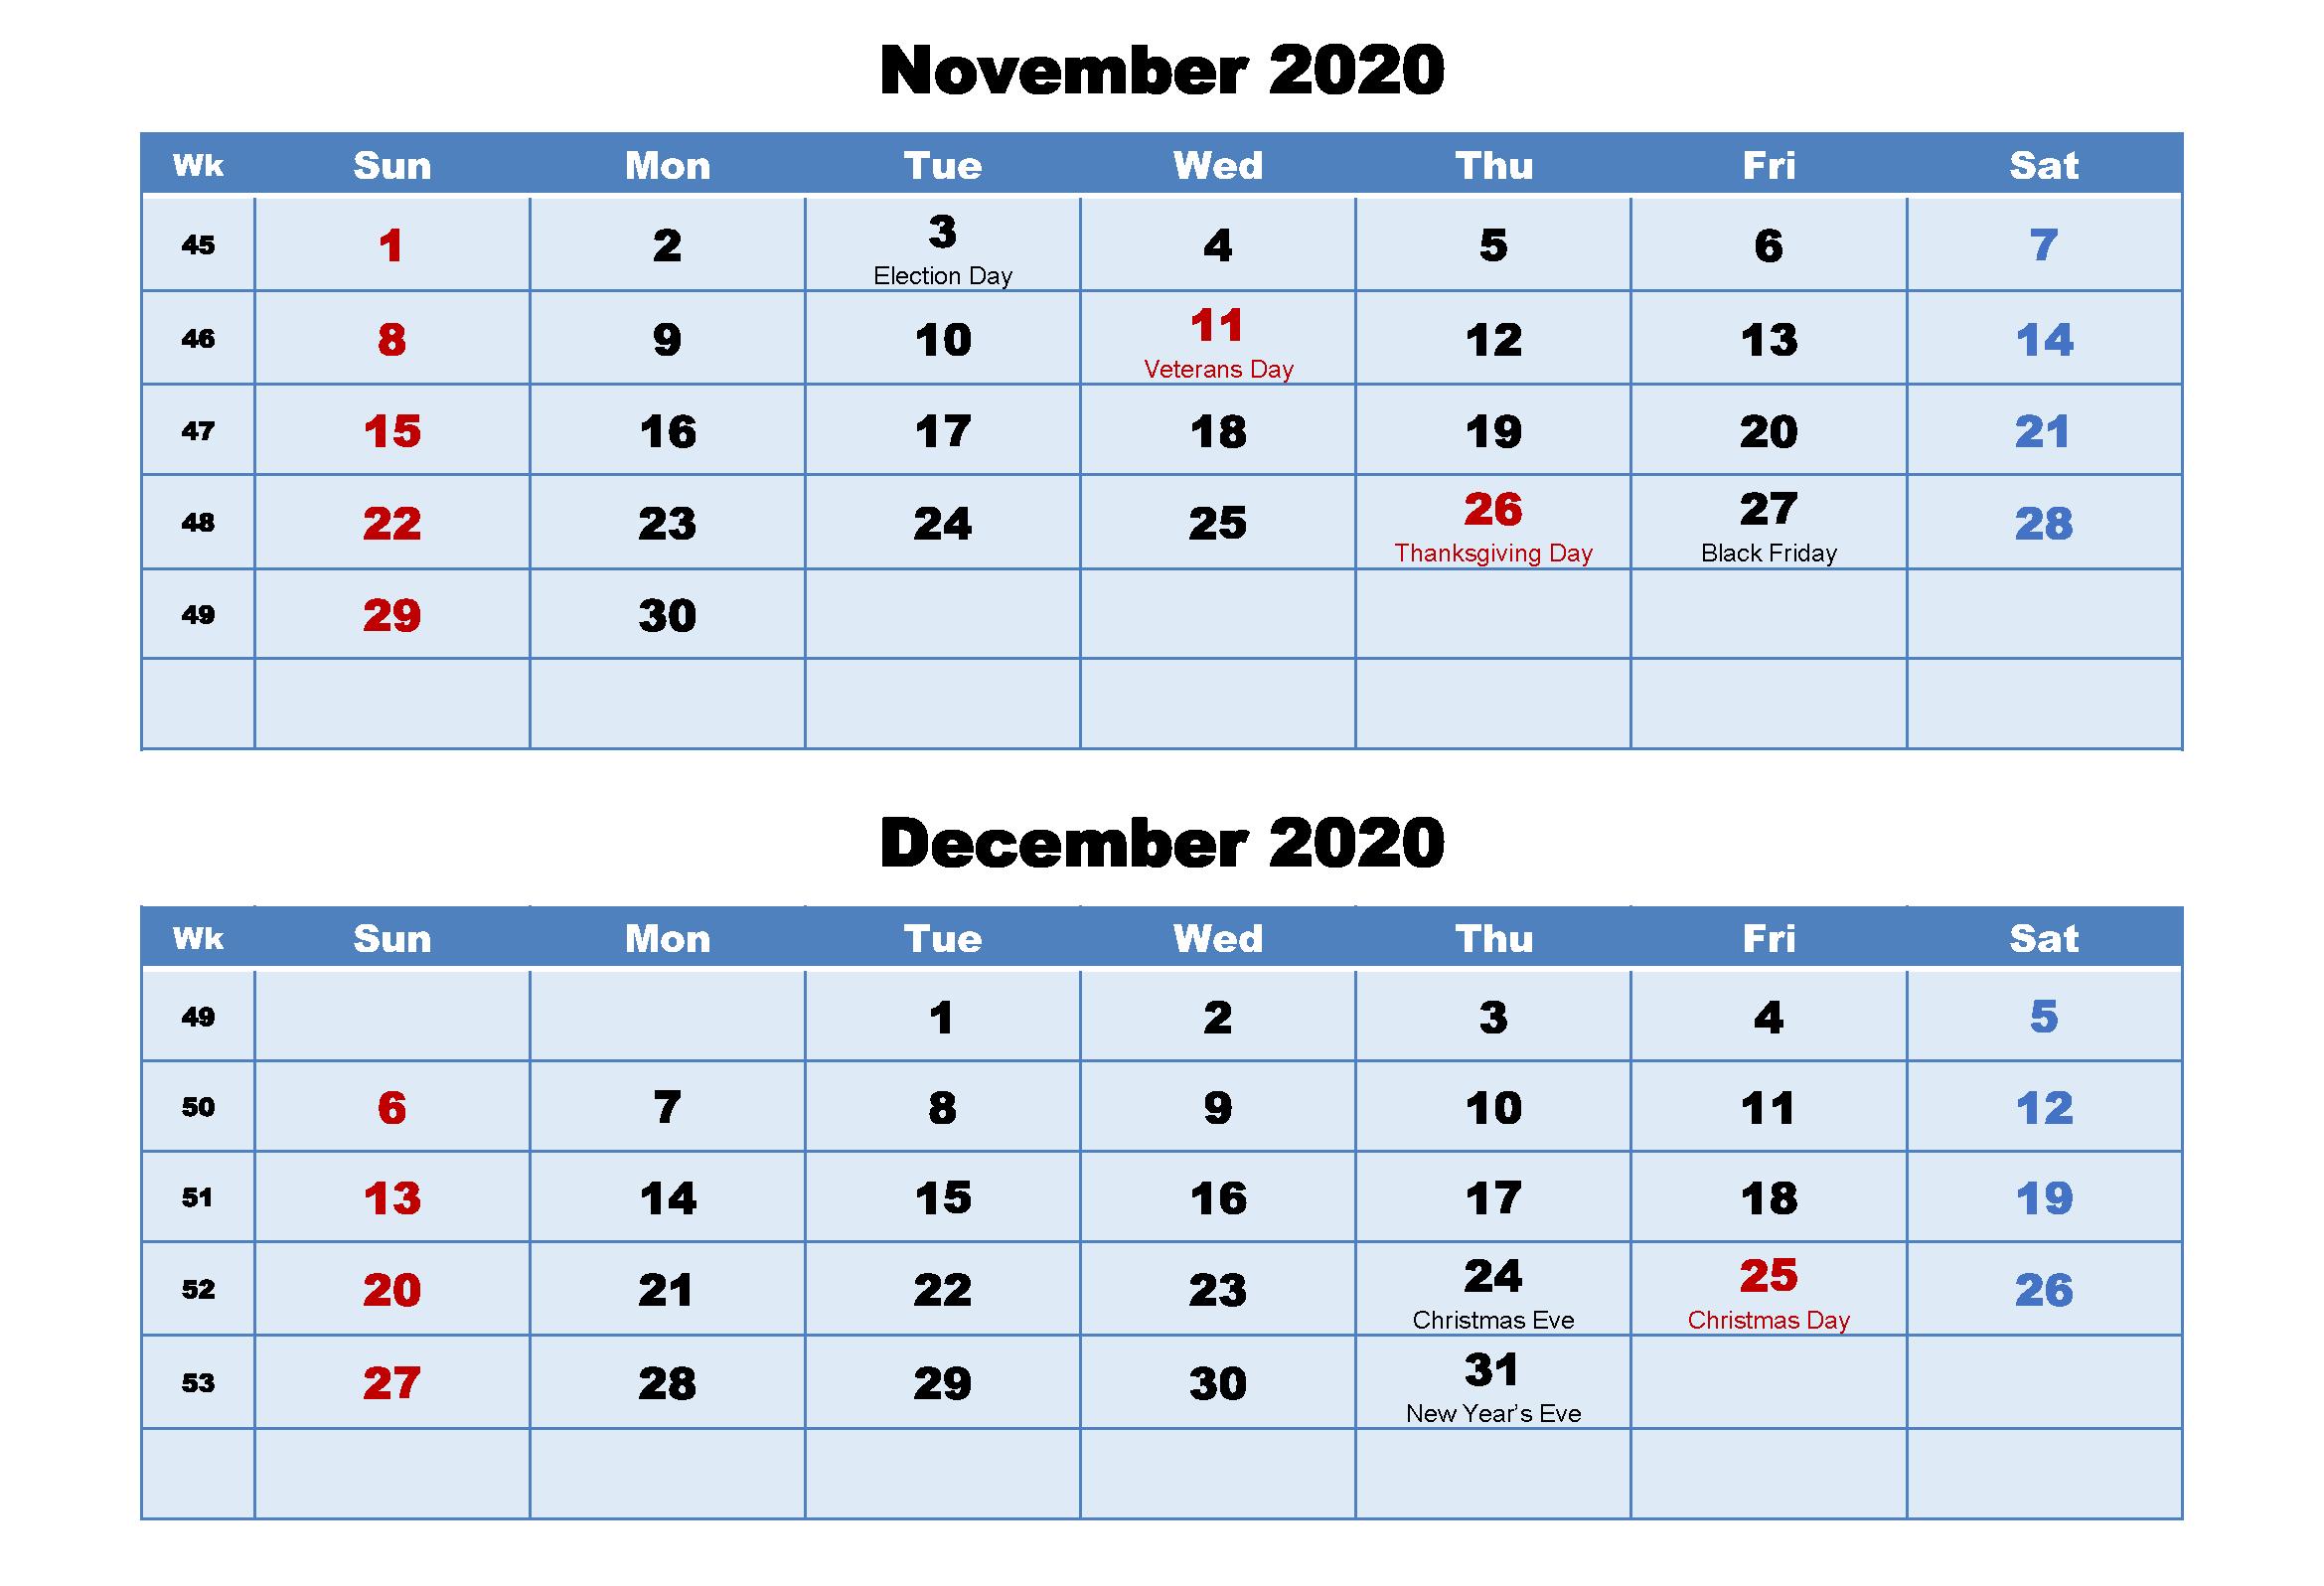 November December 2020 Holidays Calendar